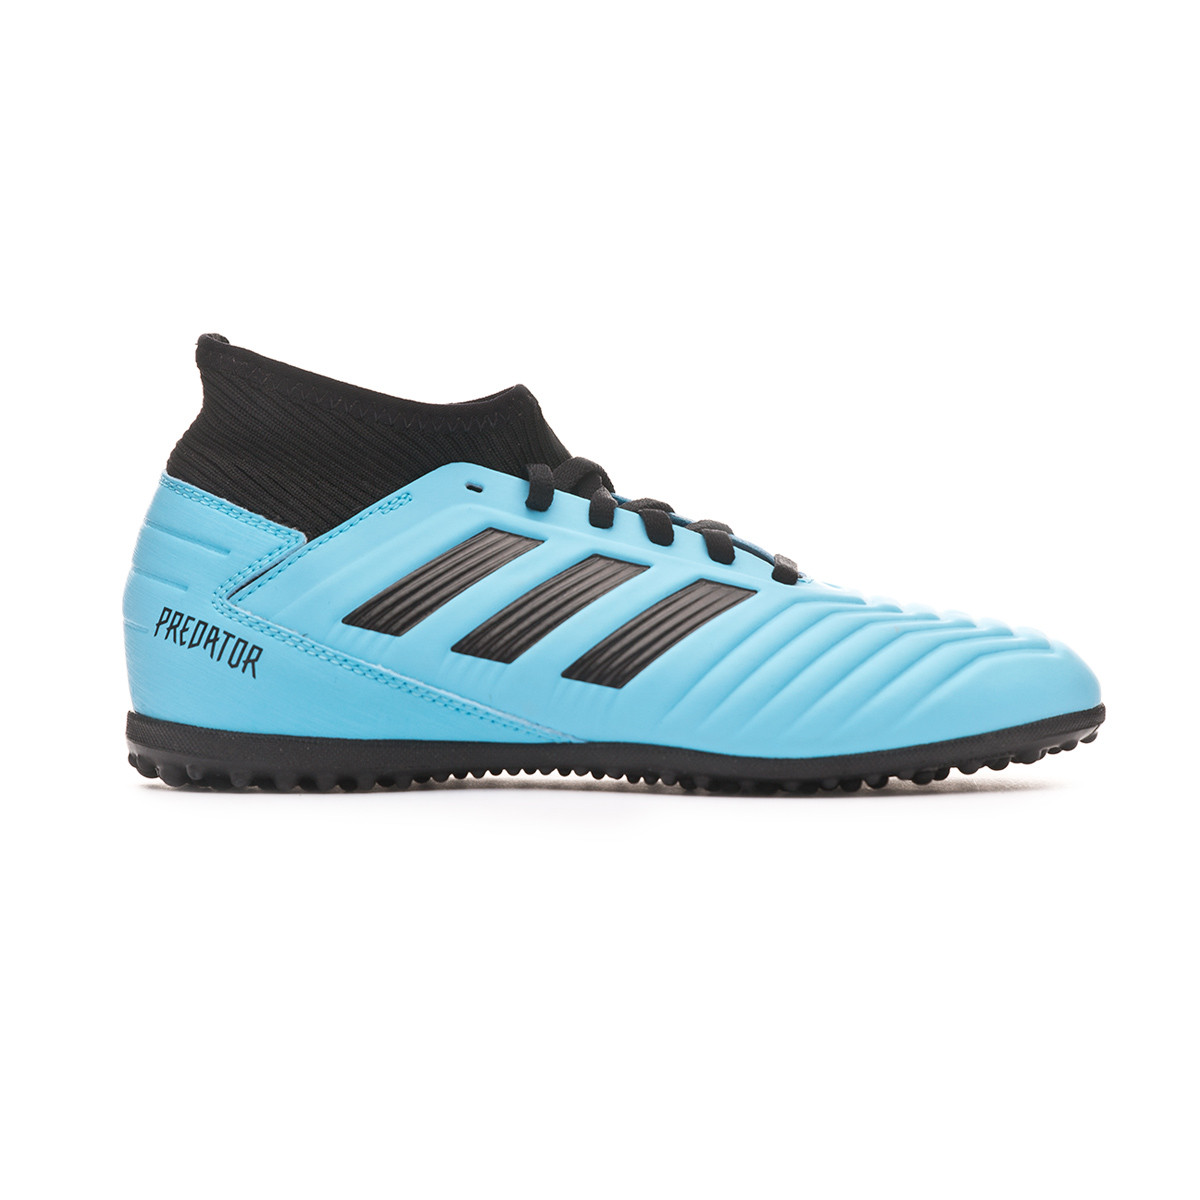 Comida sana Deshonestidad En marcha  Football Boots adidas Predator 19.3 Turf Niño Bright cyan-Core black-Solar  yellow - Football store Fútbol Emotion